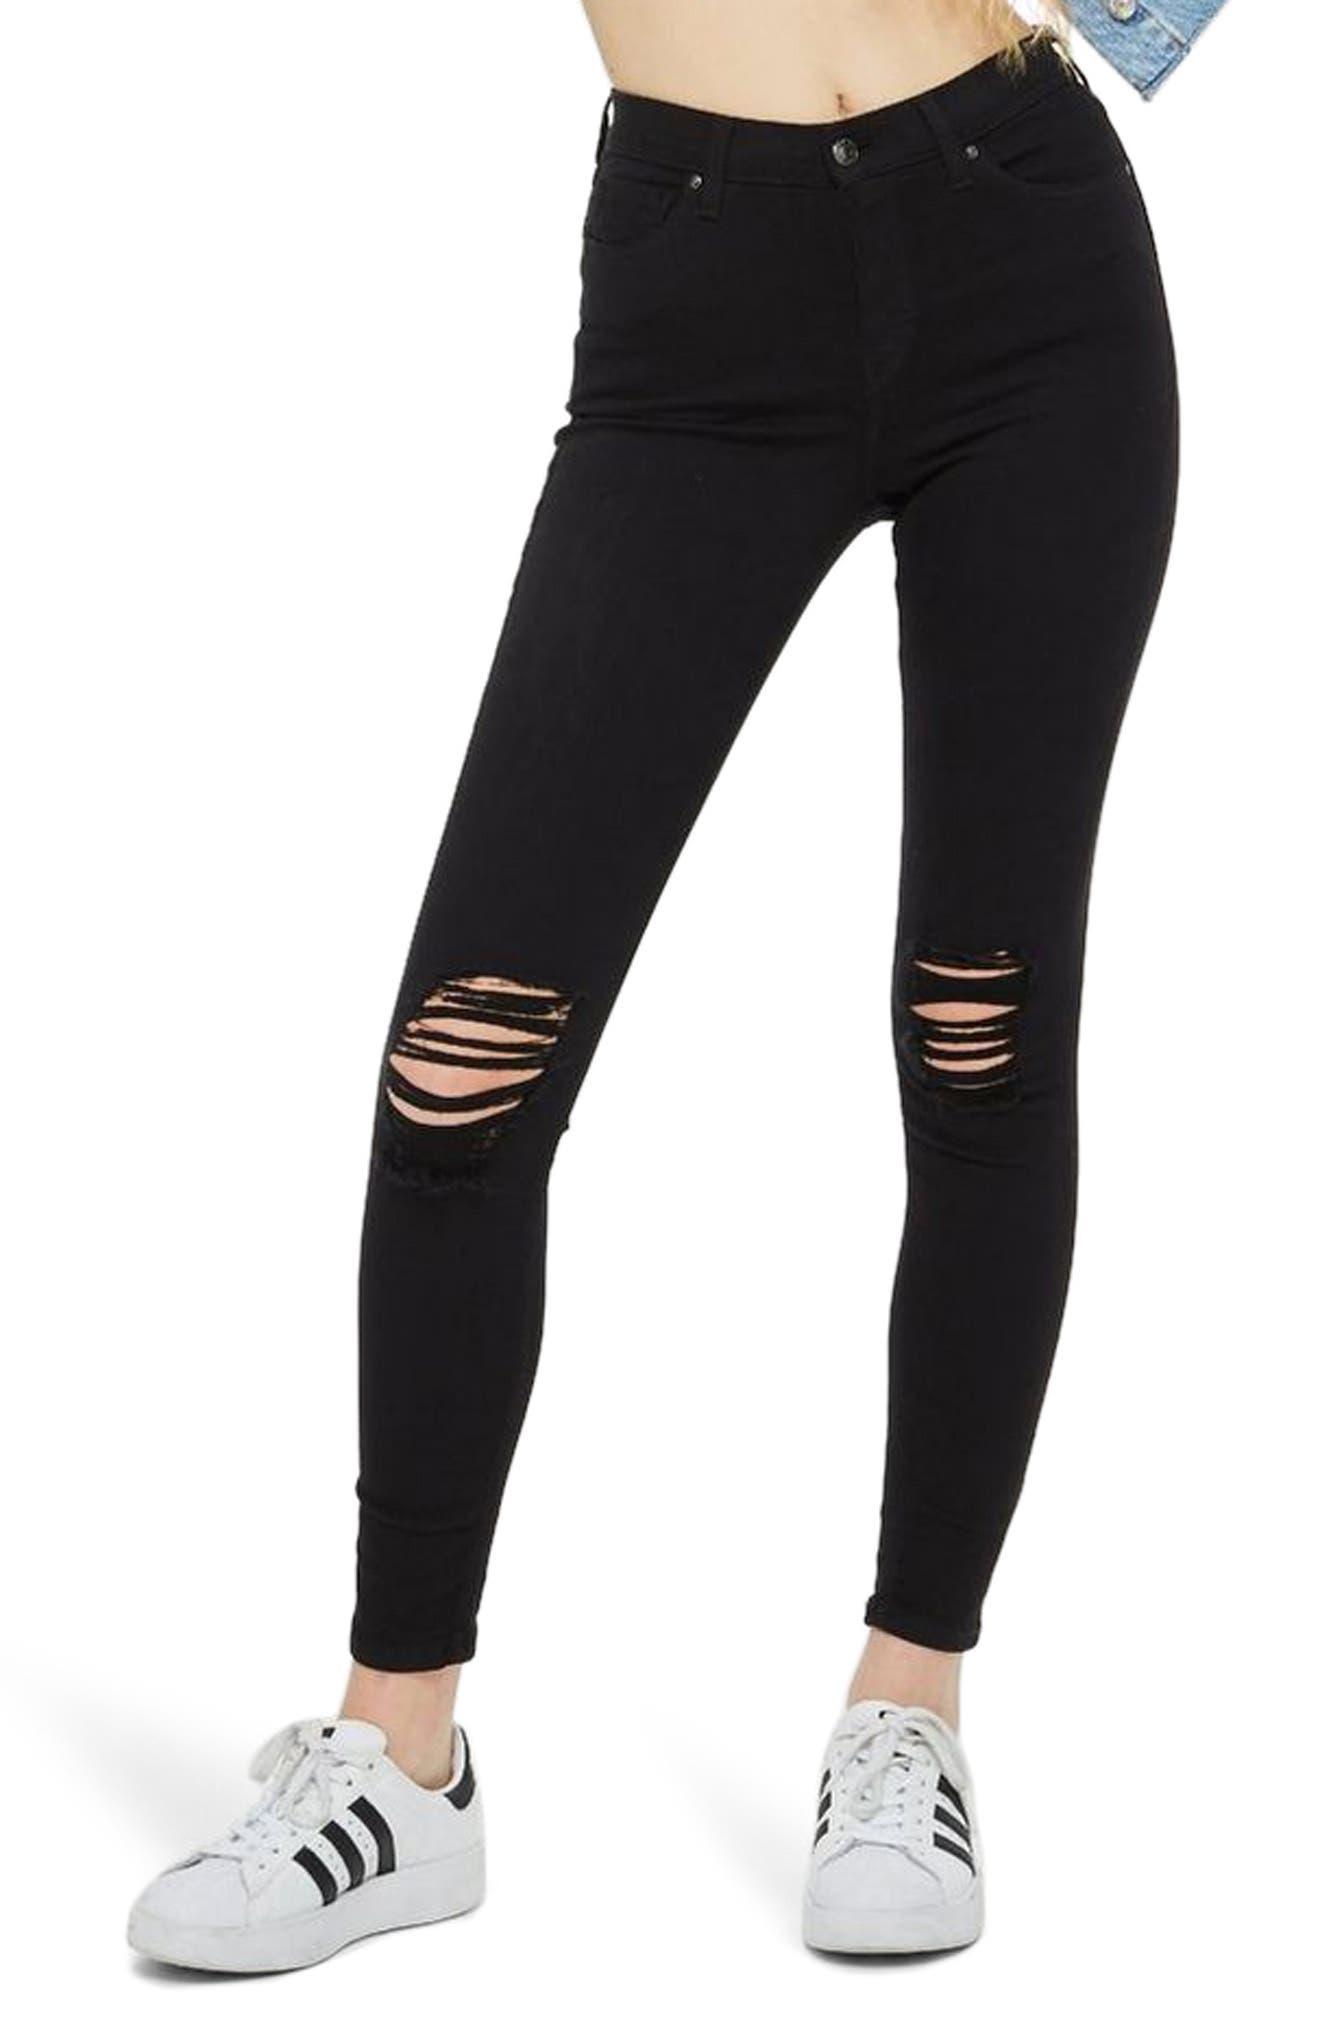 TOPSHOP, Moto Jamie High Waist Ripped Black Jeans, Main thumbnail 1, color, BLACK